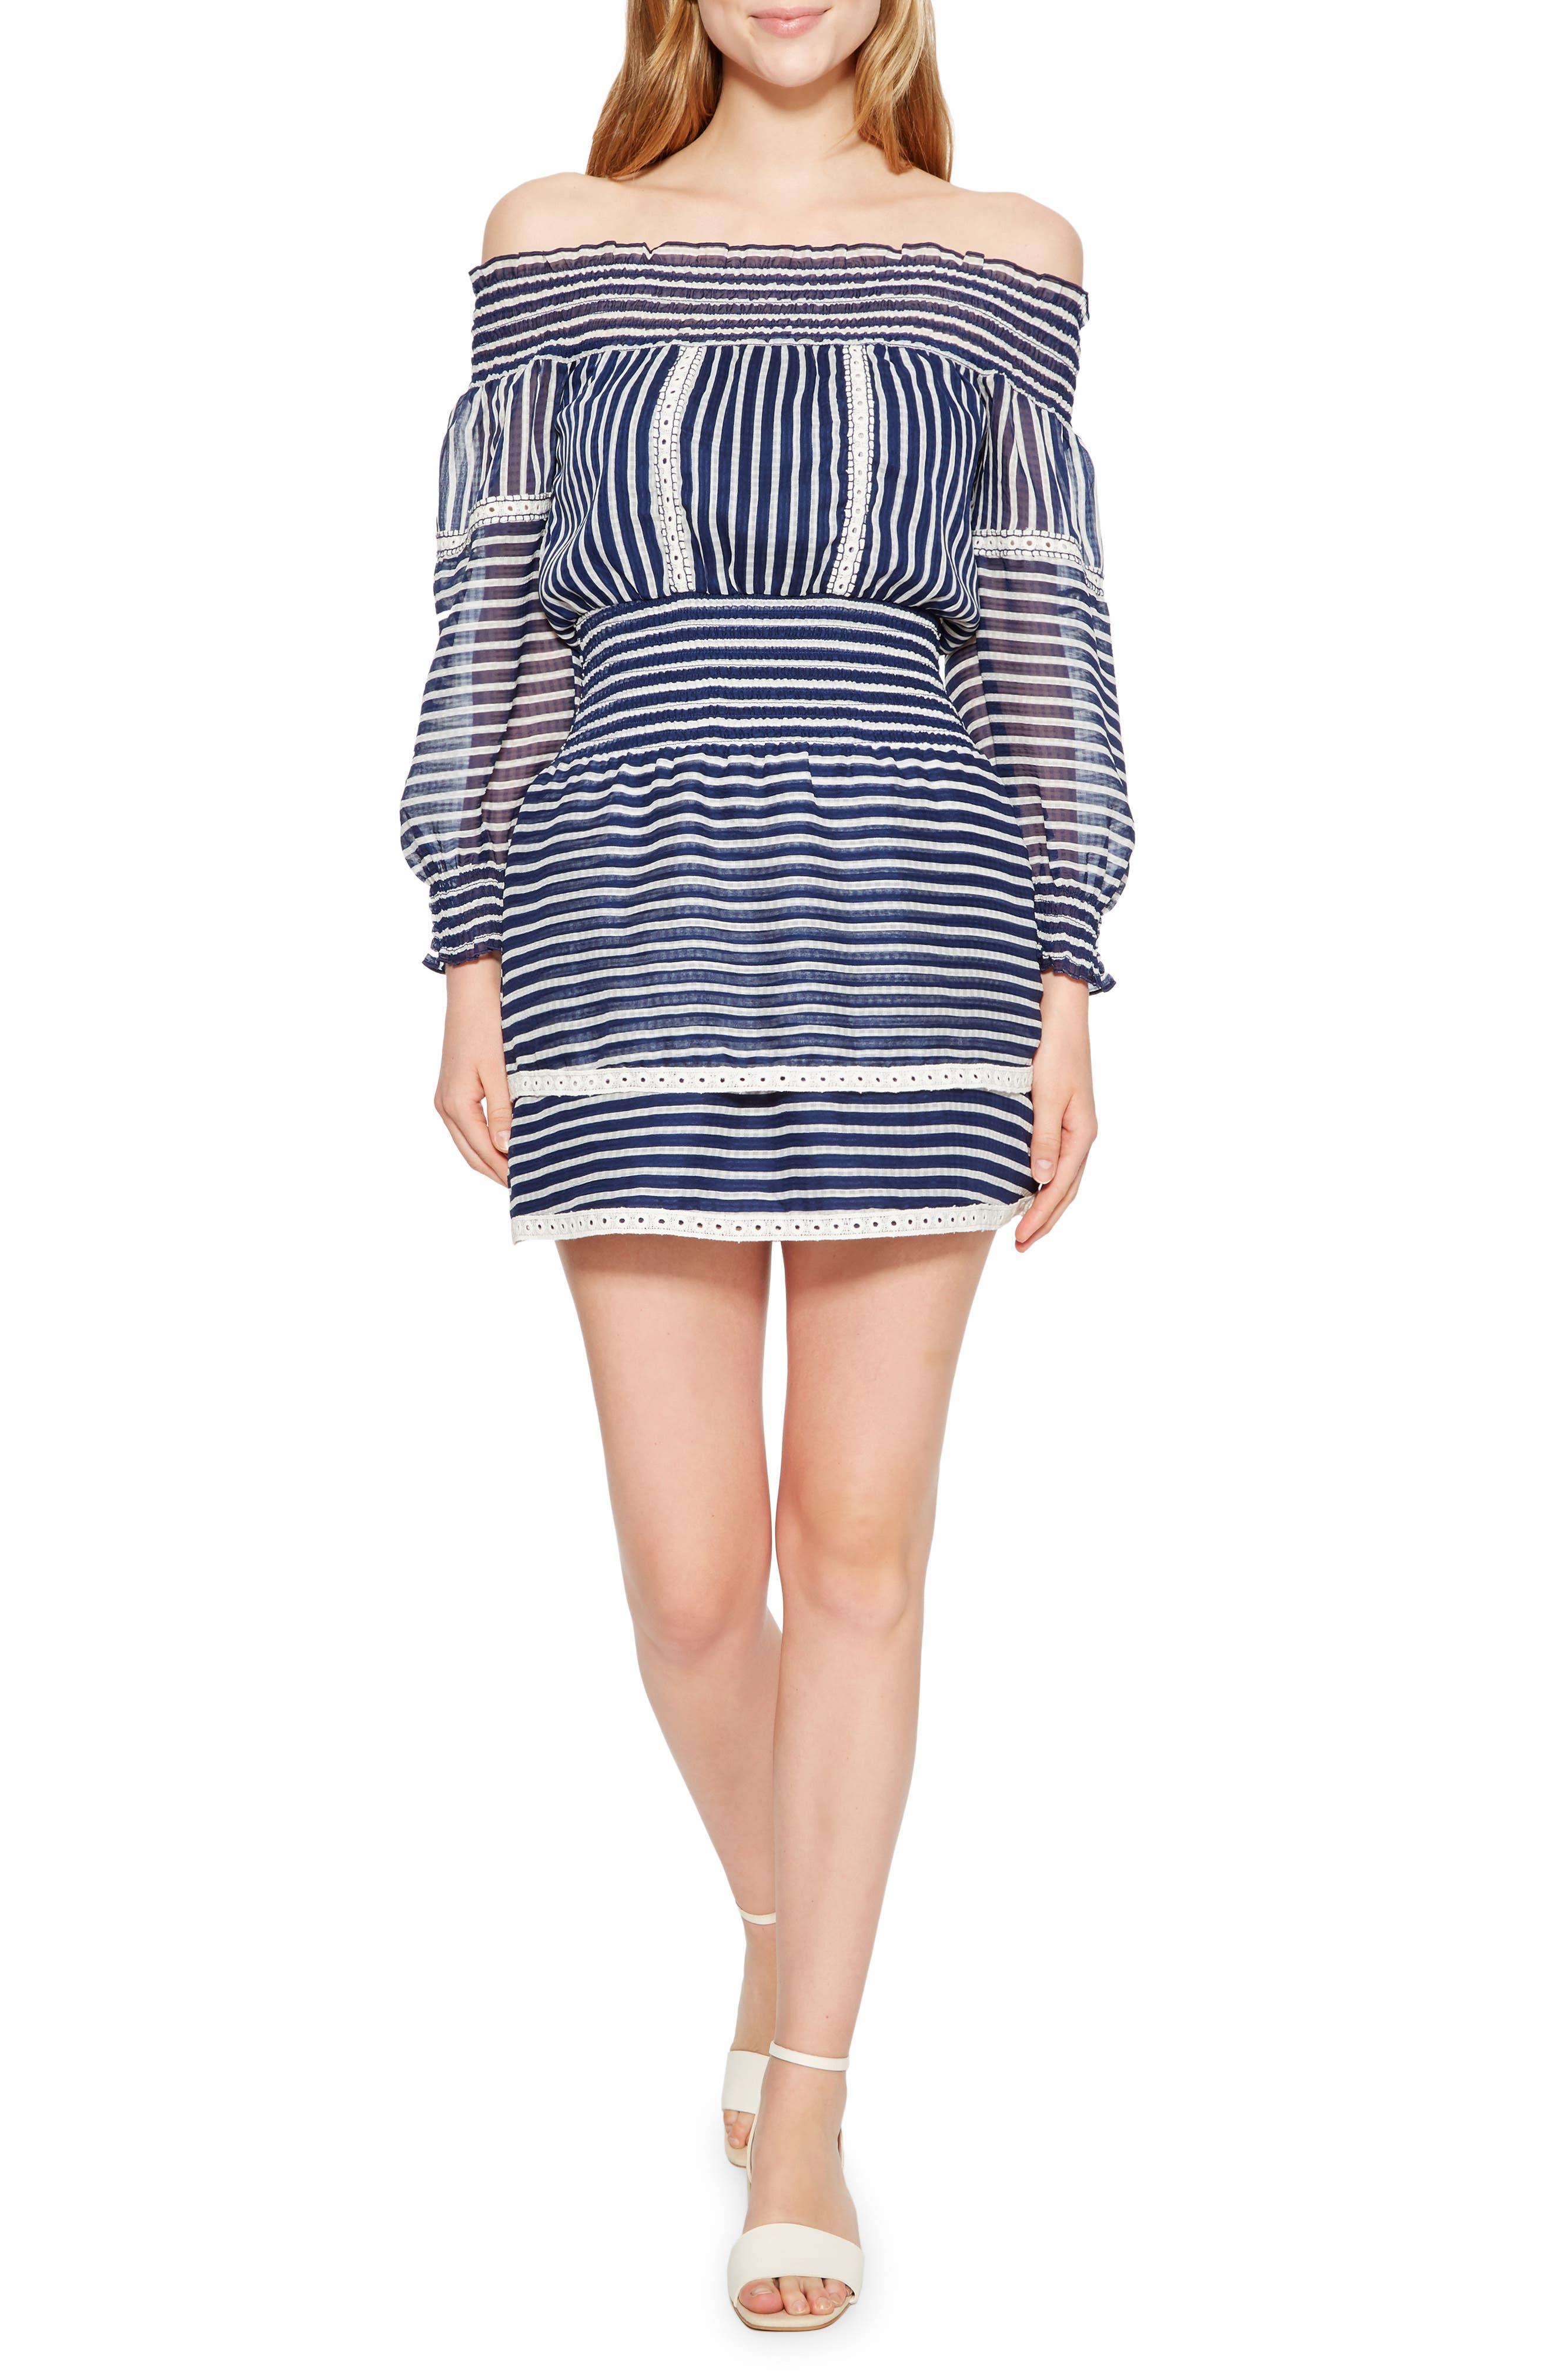 Carah Stripe Off the Shoulder Dress,                         Main,                         color, 496